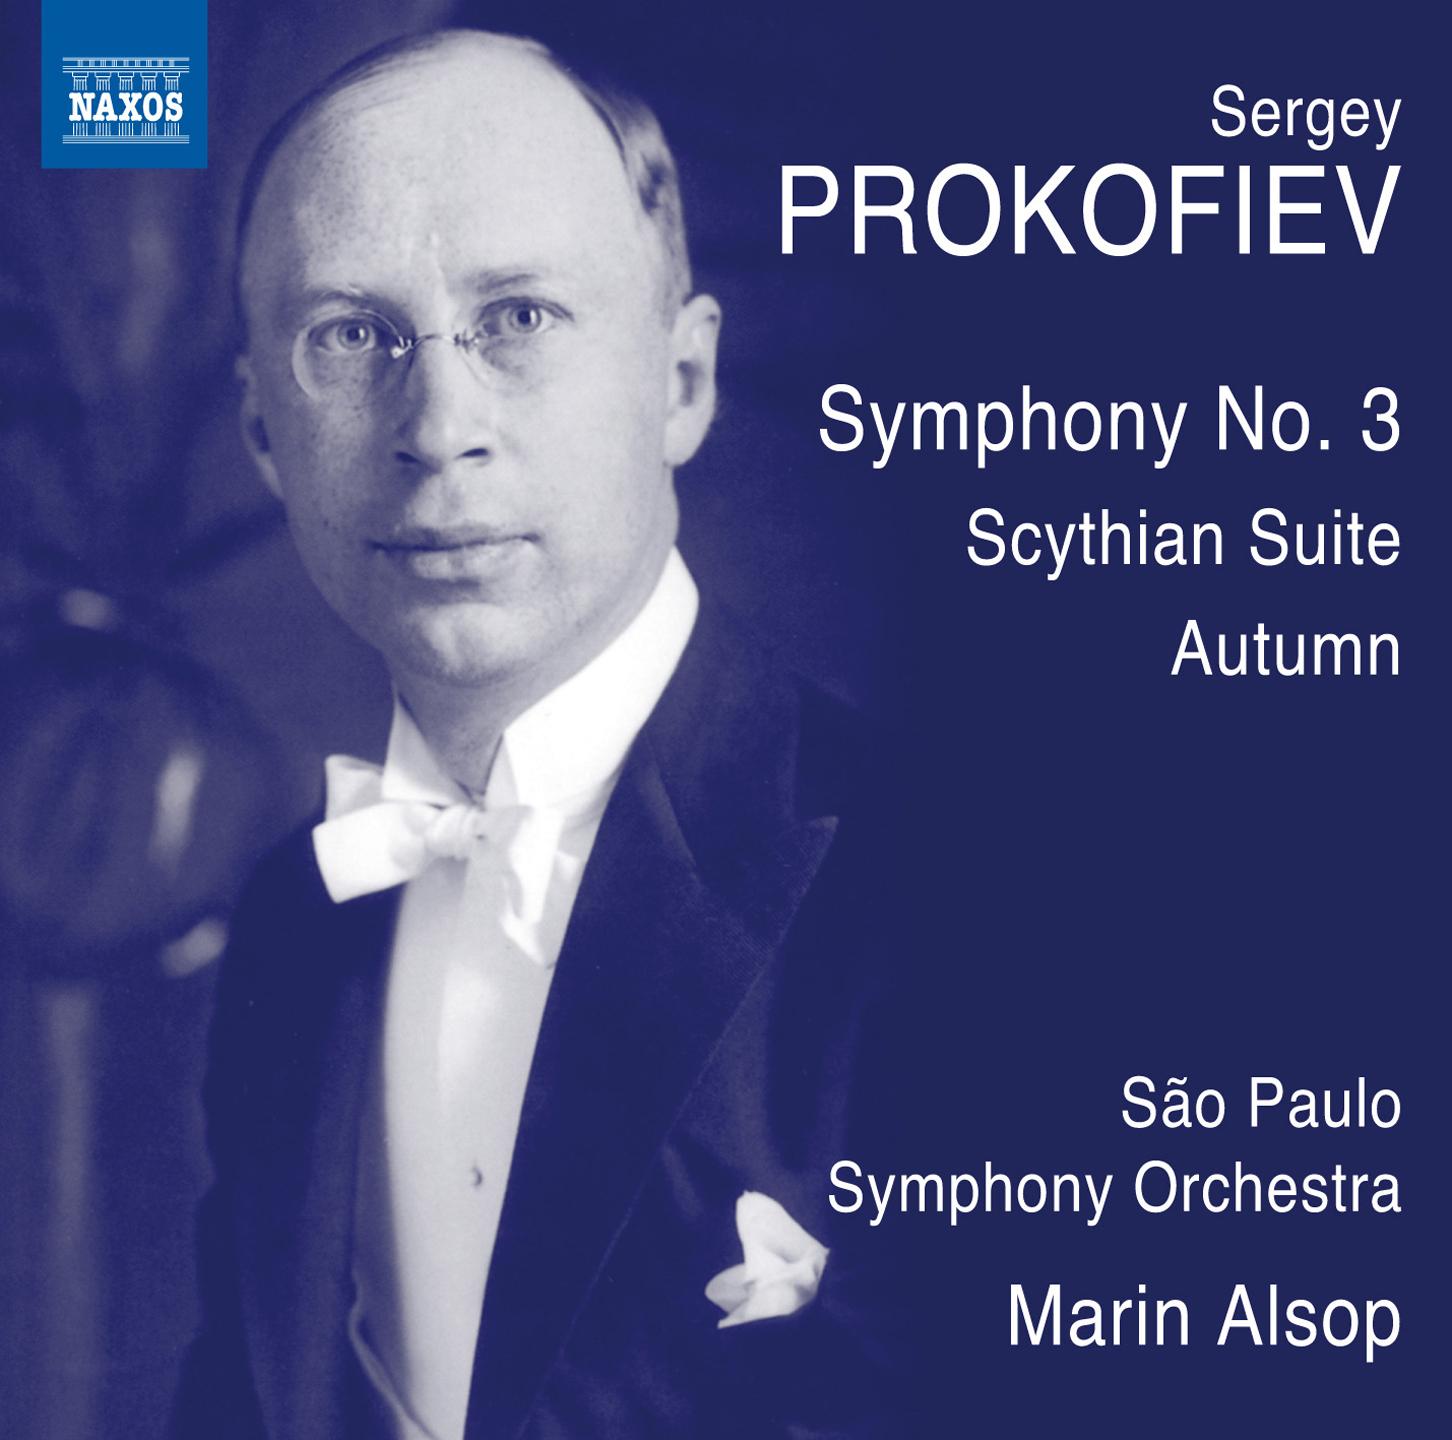 Prokofiev: Symphony No. 3, Op. 44 & Scythian Suite, Op. 20